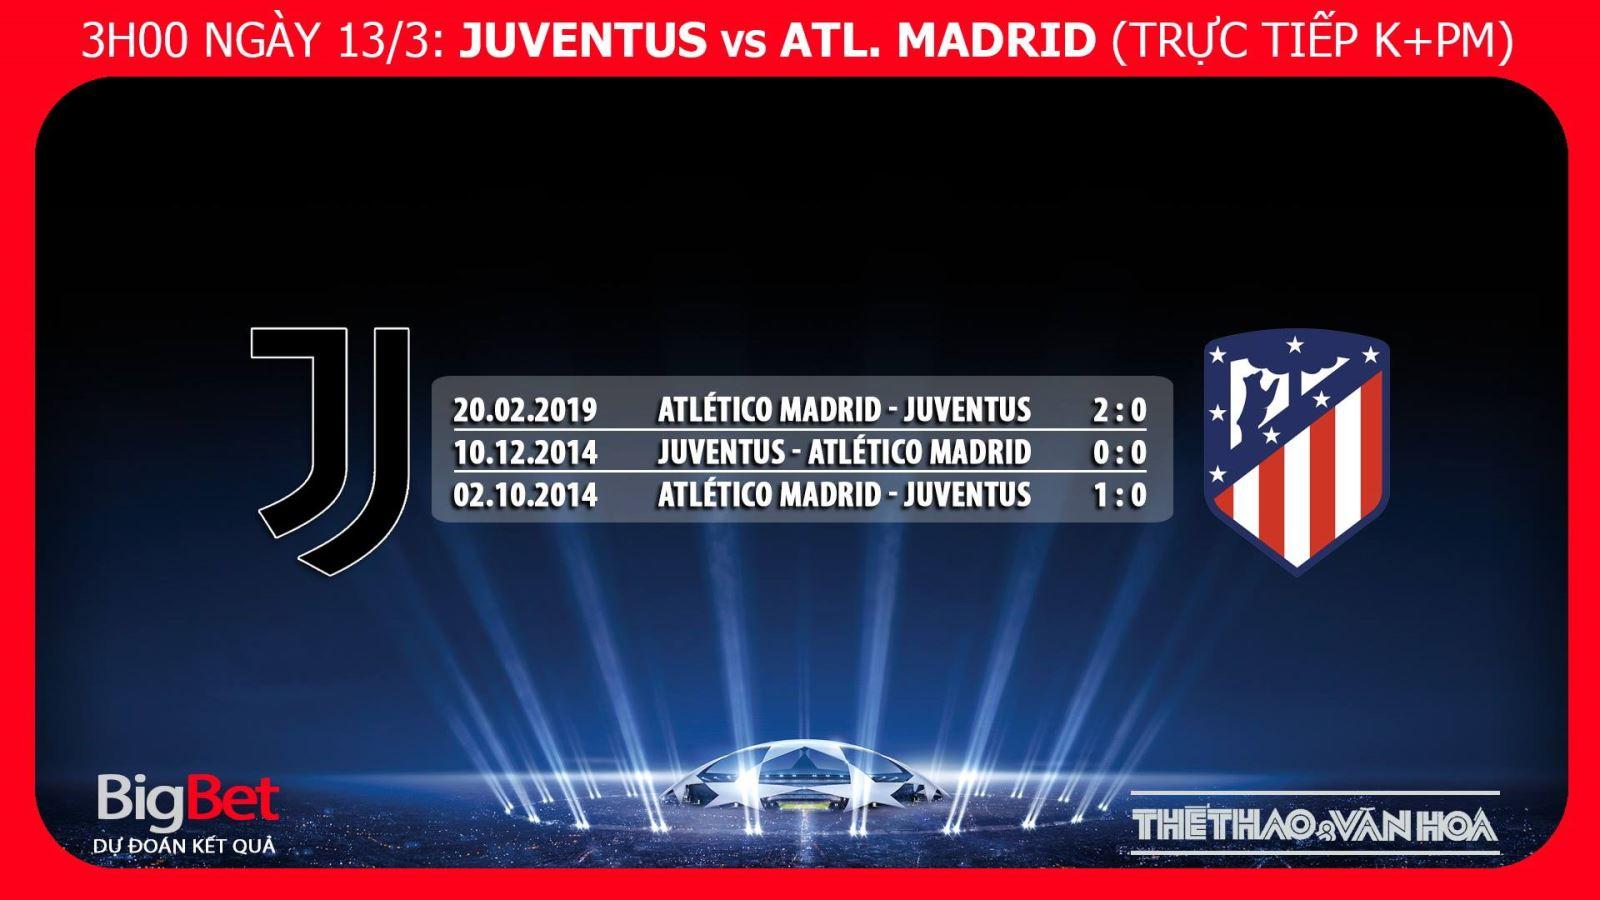 Juventus, Juve, Juventus vs Atletico Madrid, trực tiếp bóng đá, Juventus vs Atletico, truc tiep bong da, soi kèo Juventus vs Atletico Madrid, kèo Juve vs Atletico, kèo bóng đá, nhận định Juventus vs Atletico Madrid, dự đoán bóng đá